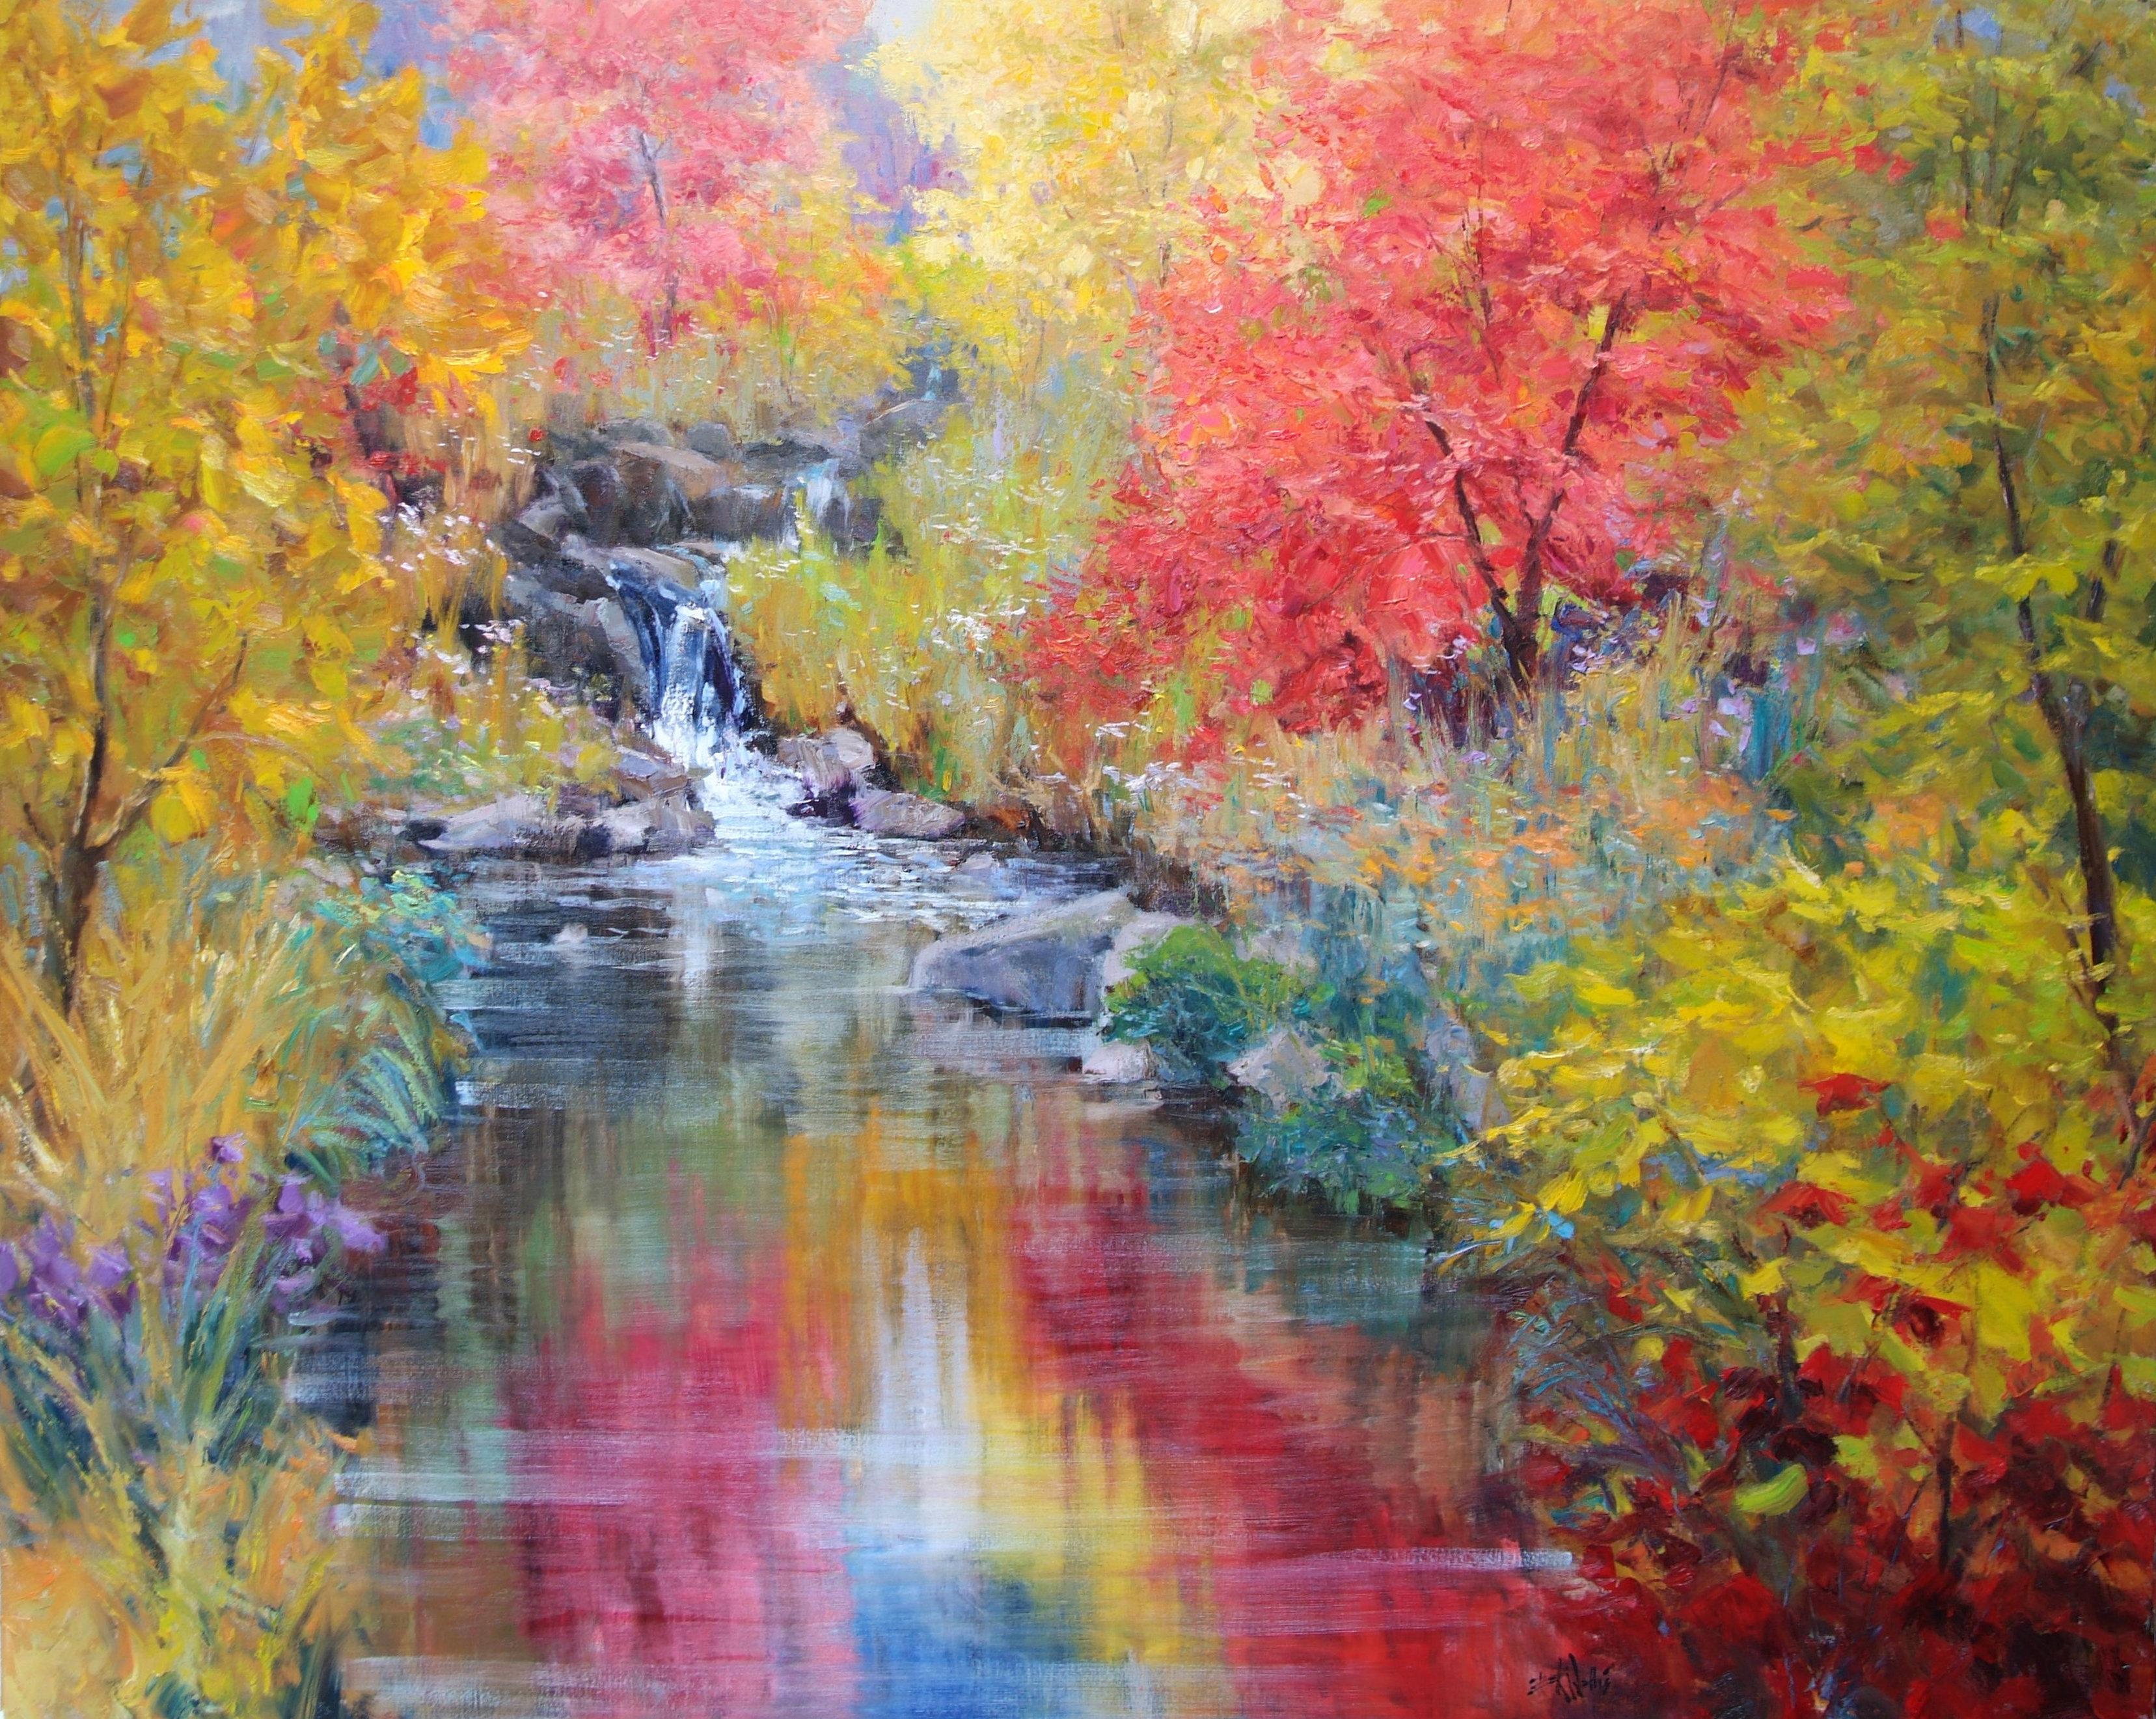 Eric Wallis - Pond and Colorful Brush